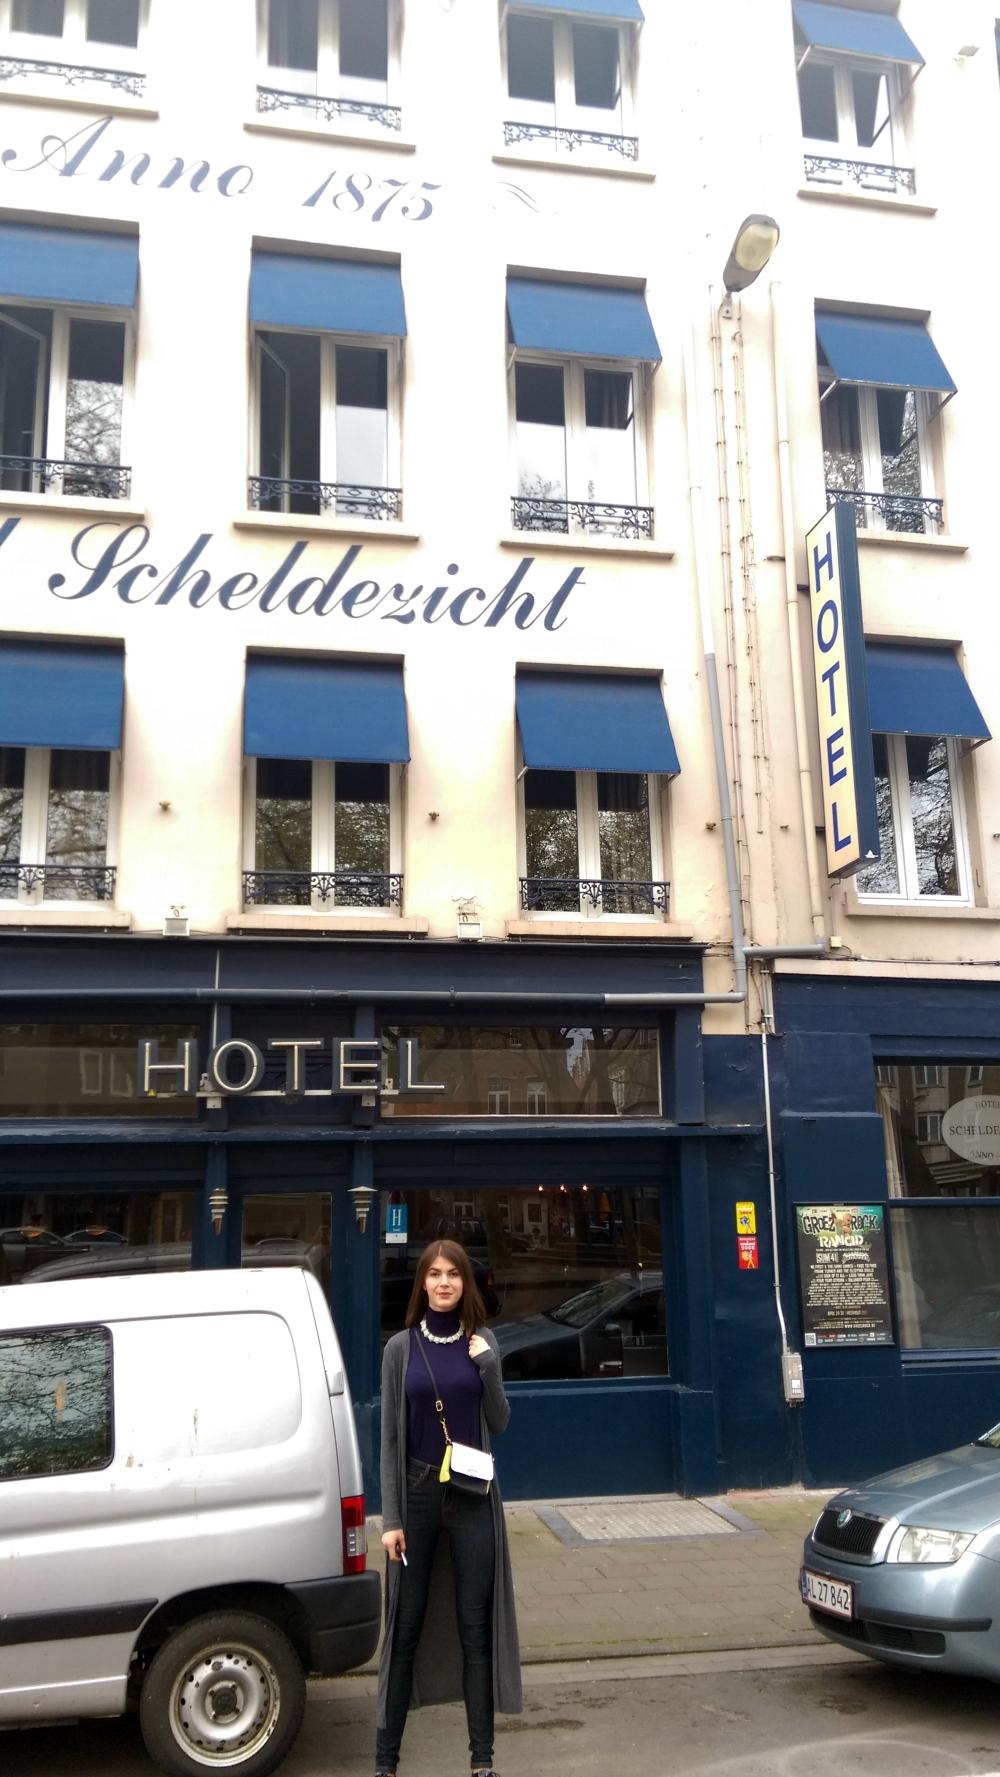 accommodation in Antwerp, where to stay in Antwerp, Scheldezich hotel opinions, glamthug blog,lifestyle blogger